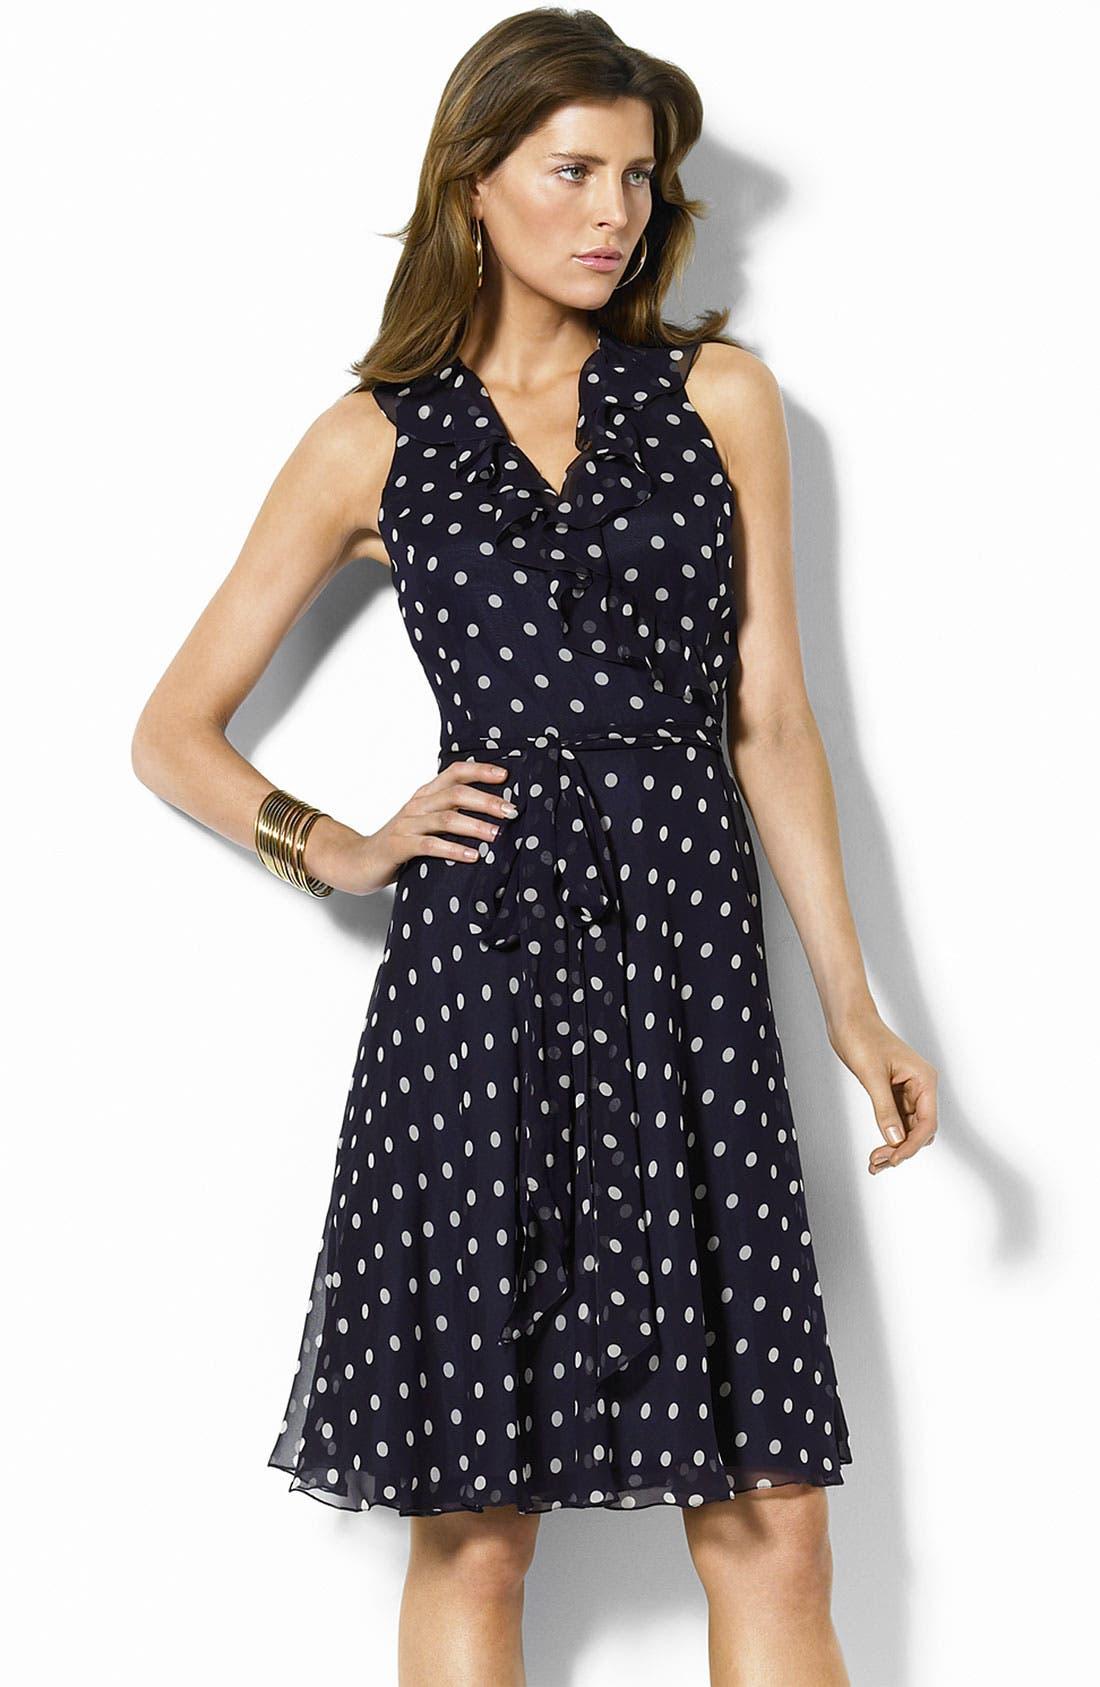 Alternate Image 1 Selected - Lauren by Ralph Lauren Georgette Wrap Dress